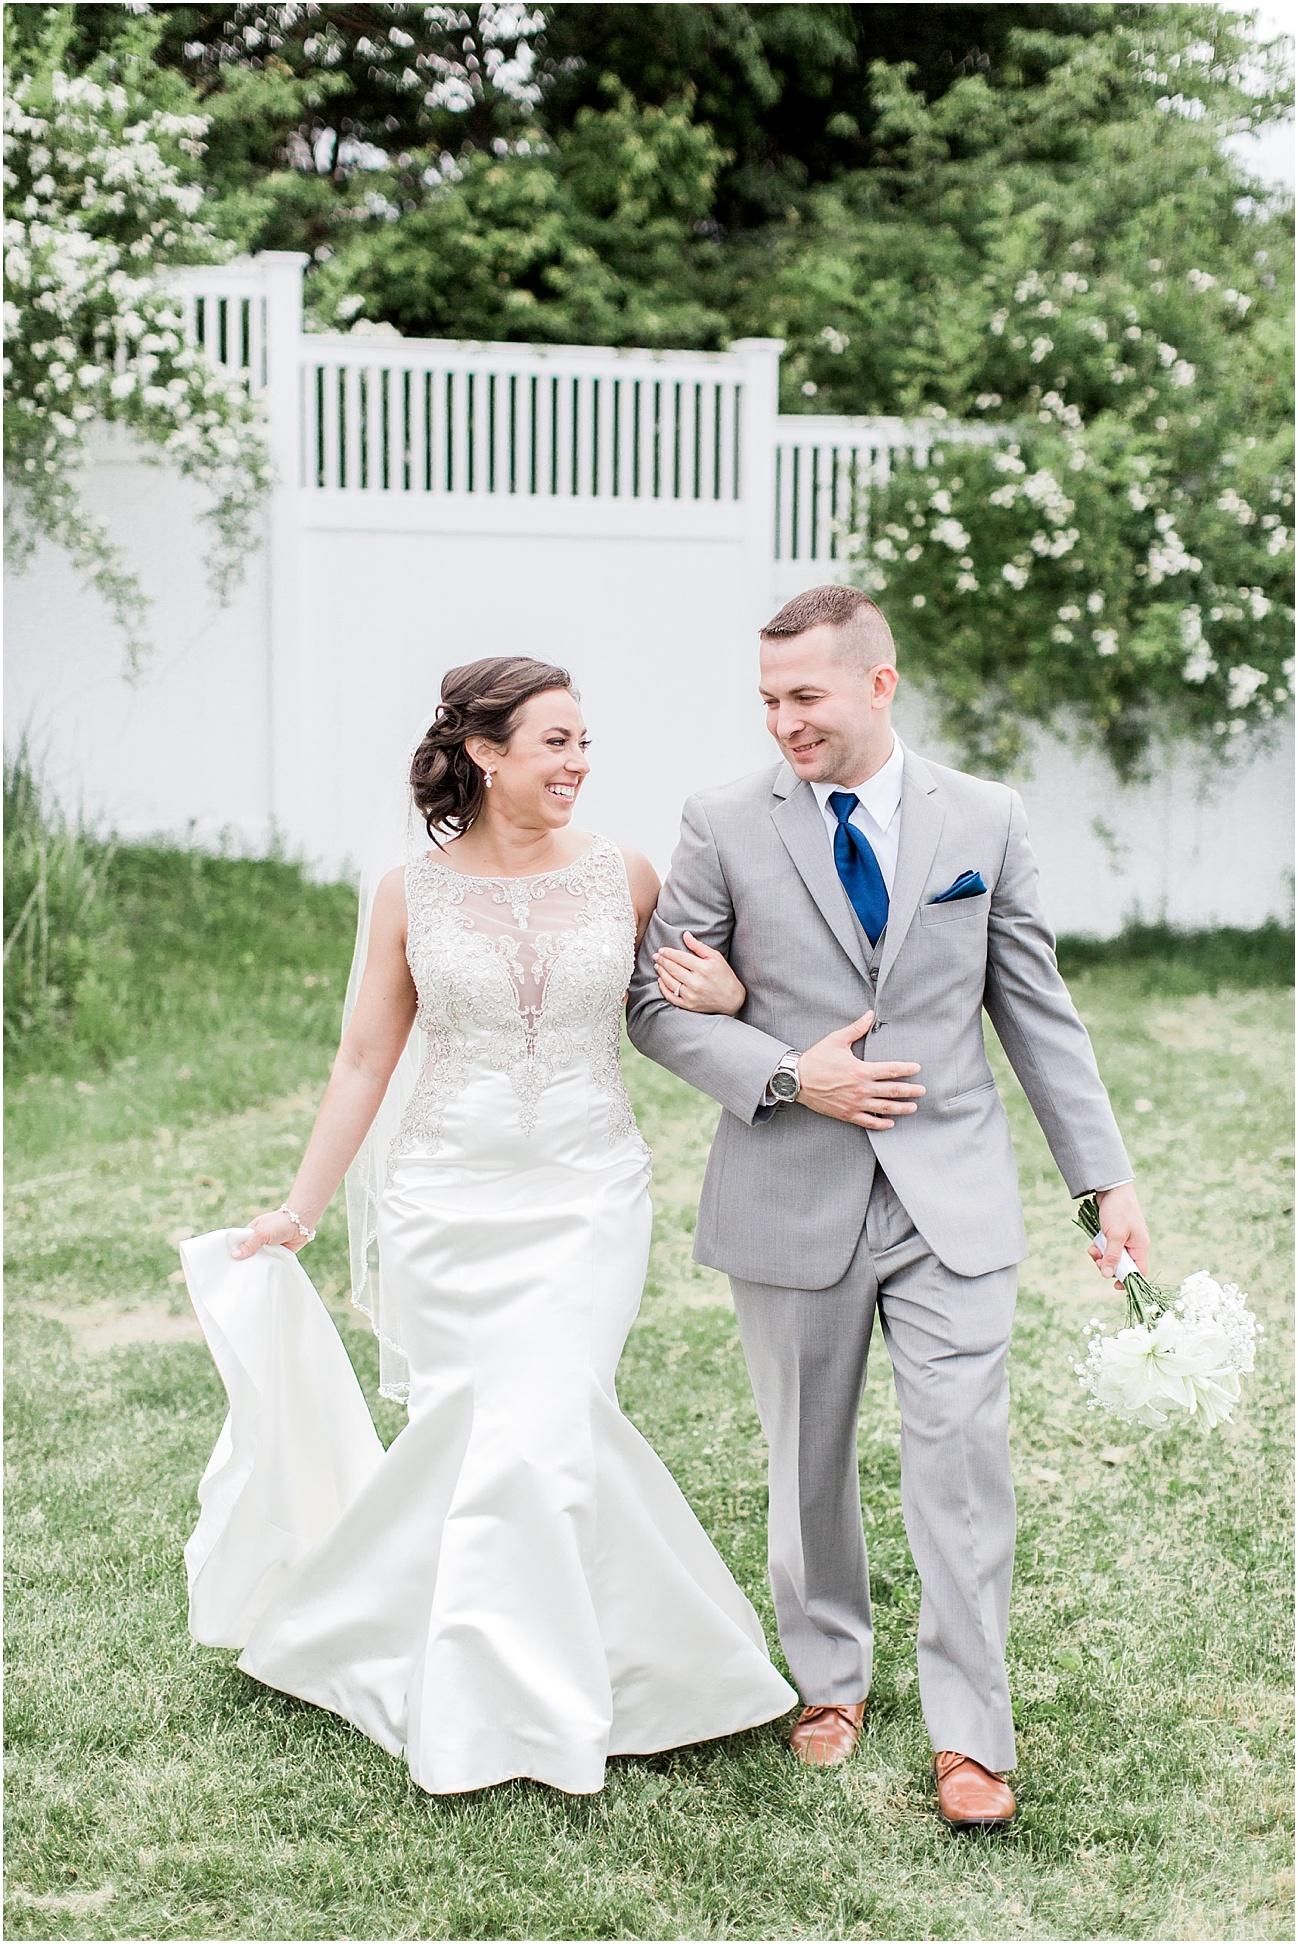 nicole_stephen_cape_club_nicky_falmouth_cod_boston_wedding_photographer_meredith_jane_photography_photo_0180.jpg